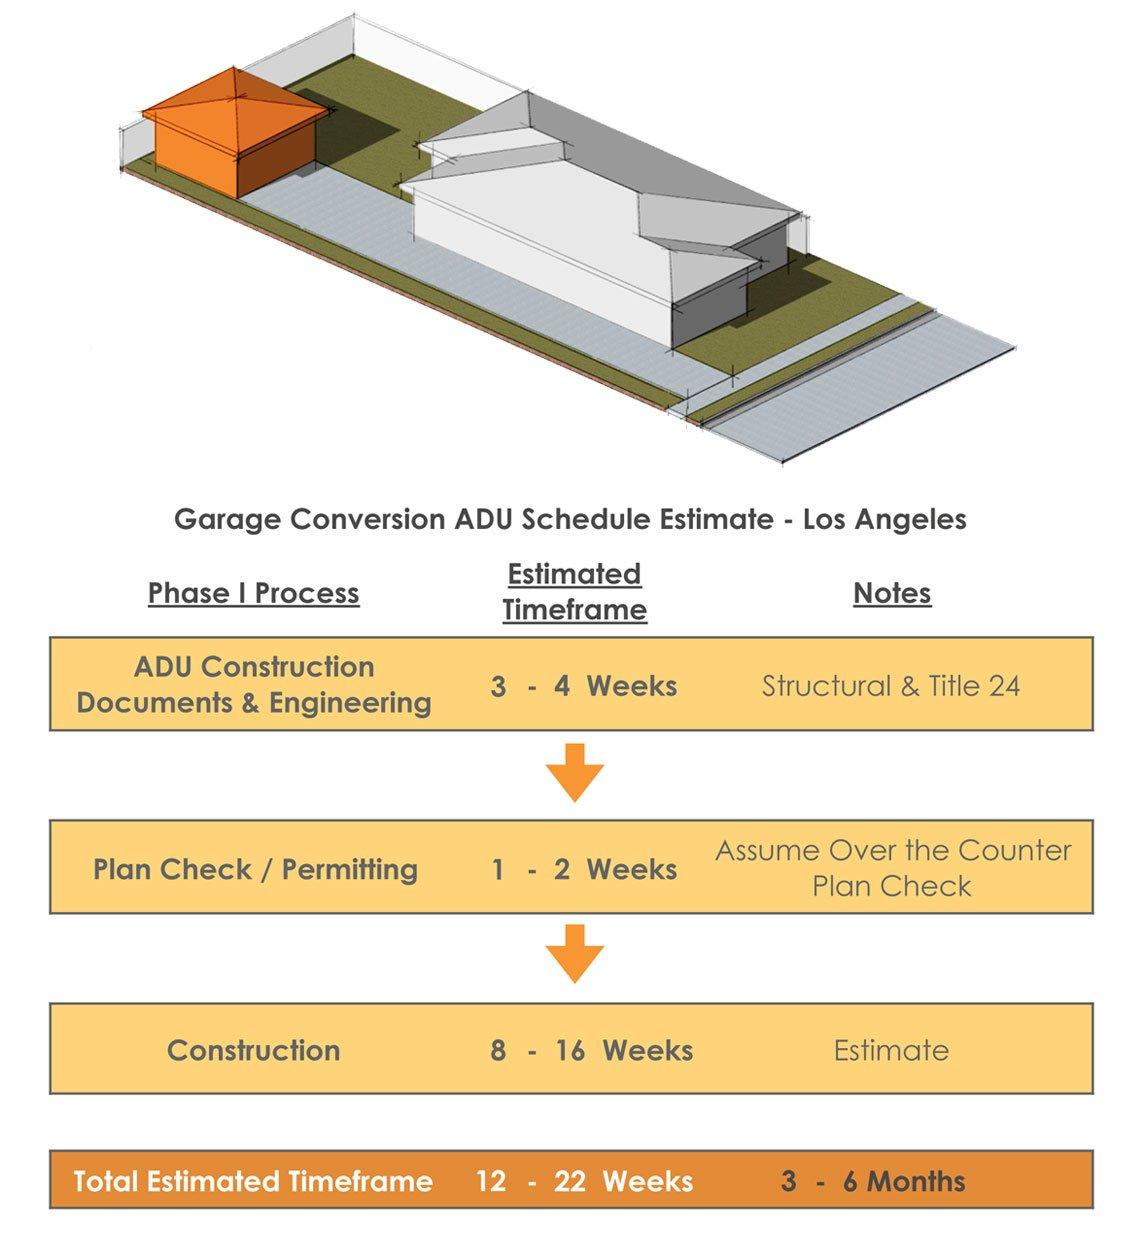 Garage-Conversion-ADU-Schedule-Process-Timeline-LA